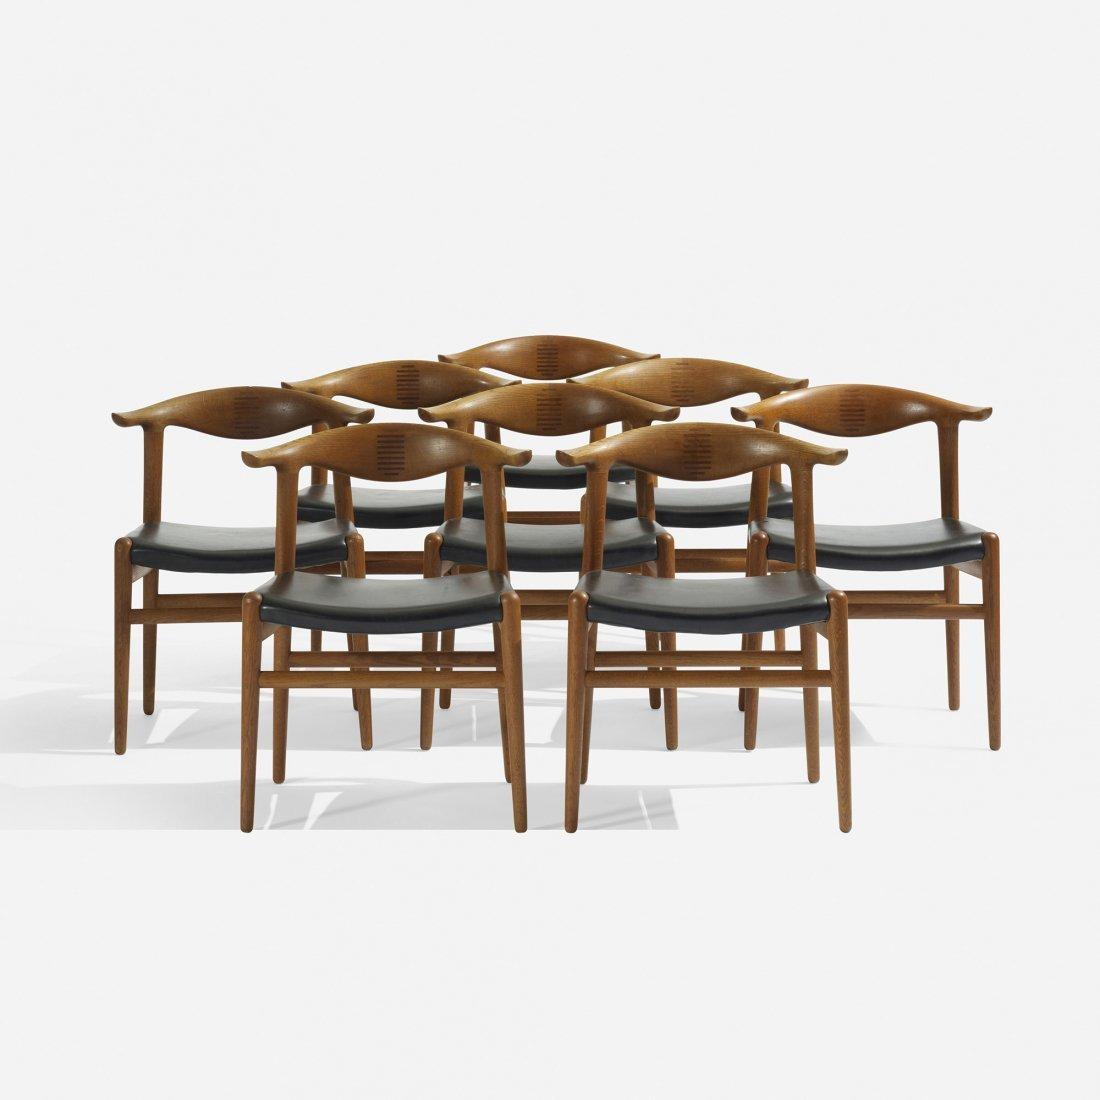 111: Hans Wegner Cow Horn chairs, set of eight